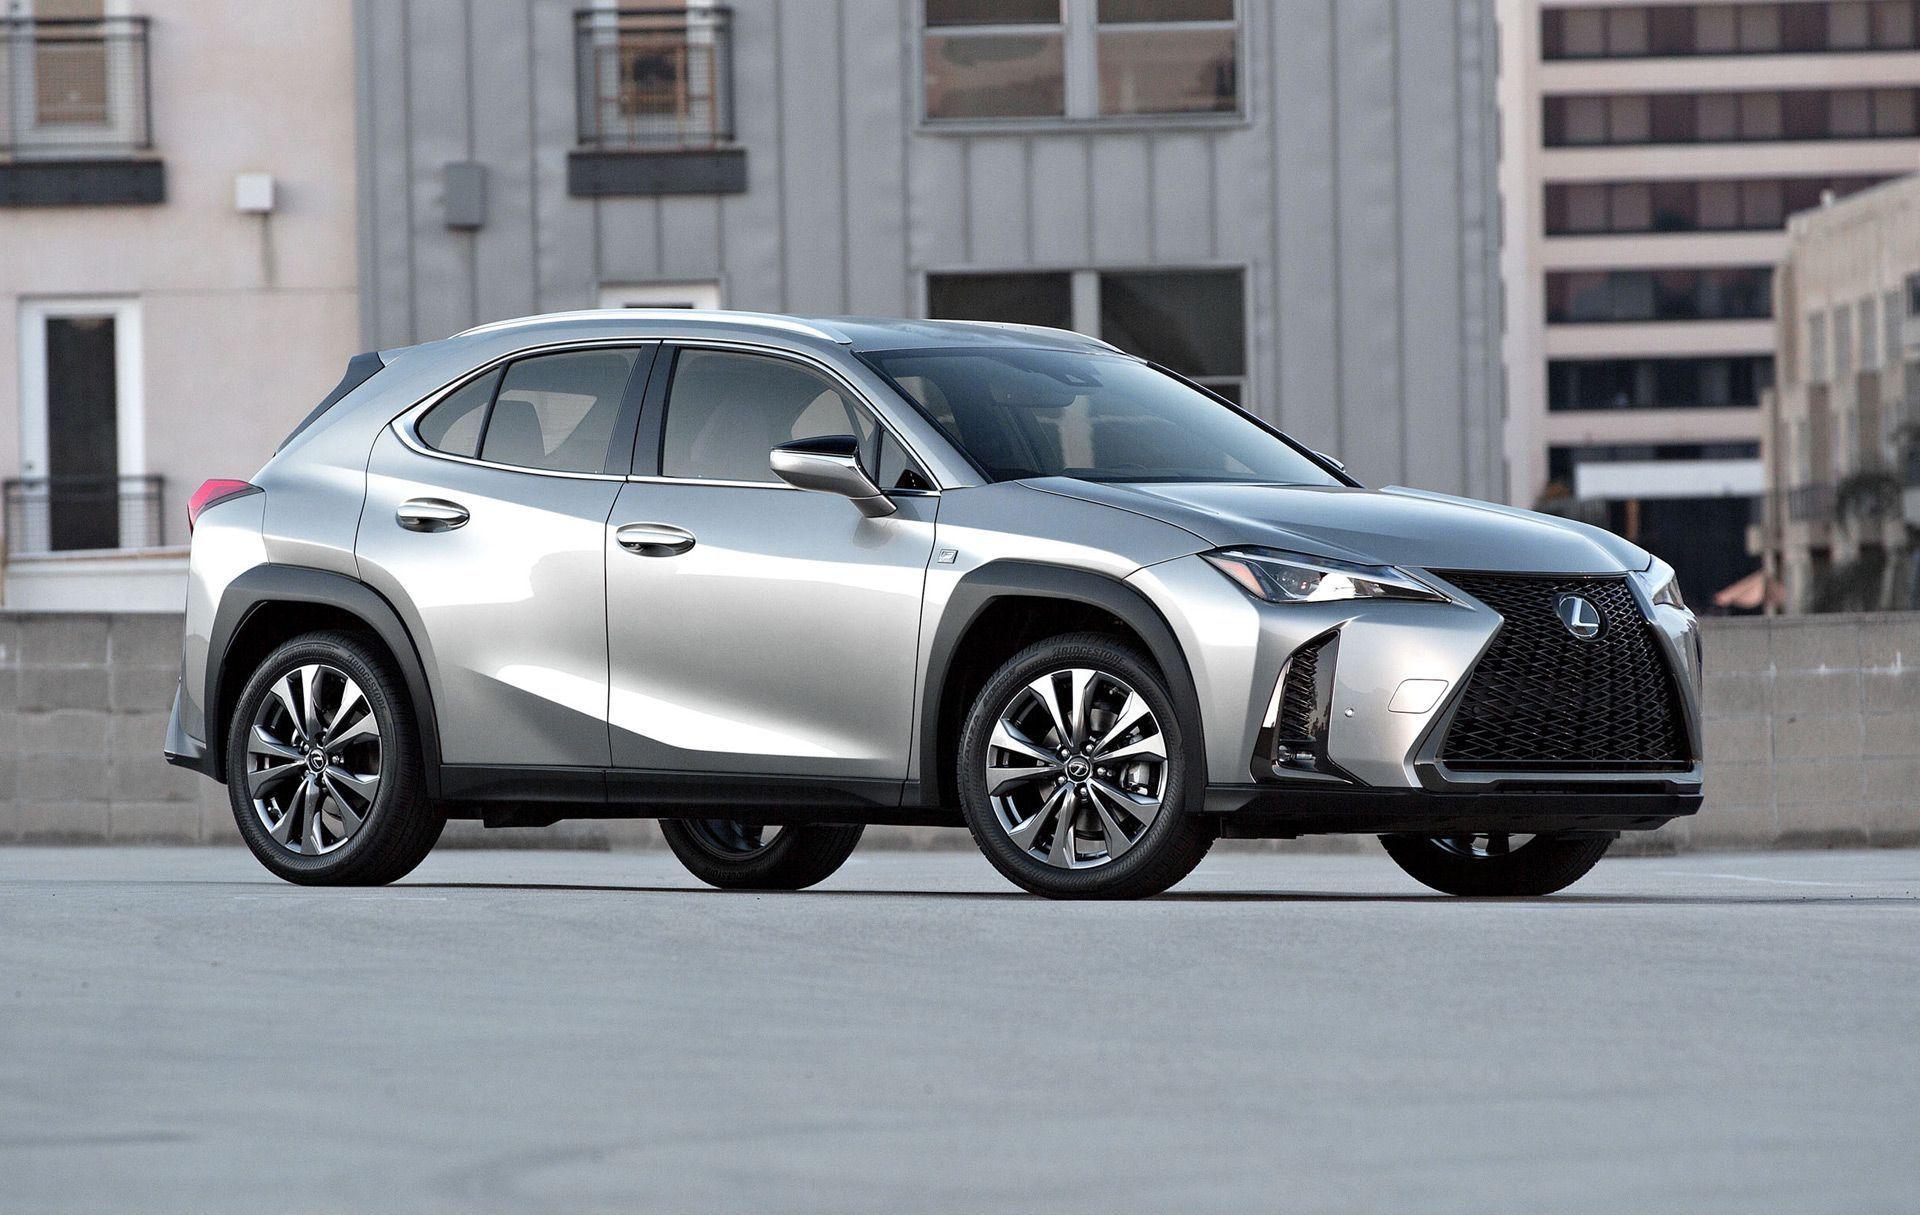 Lexus 2020 Ux Exterior Date Release Small Suv Lexus Suv Hybrid Car